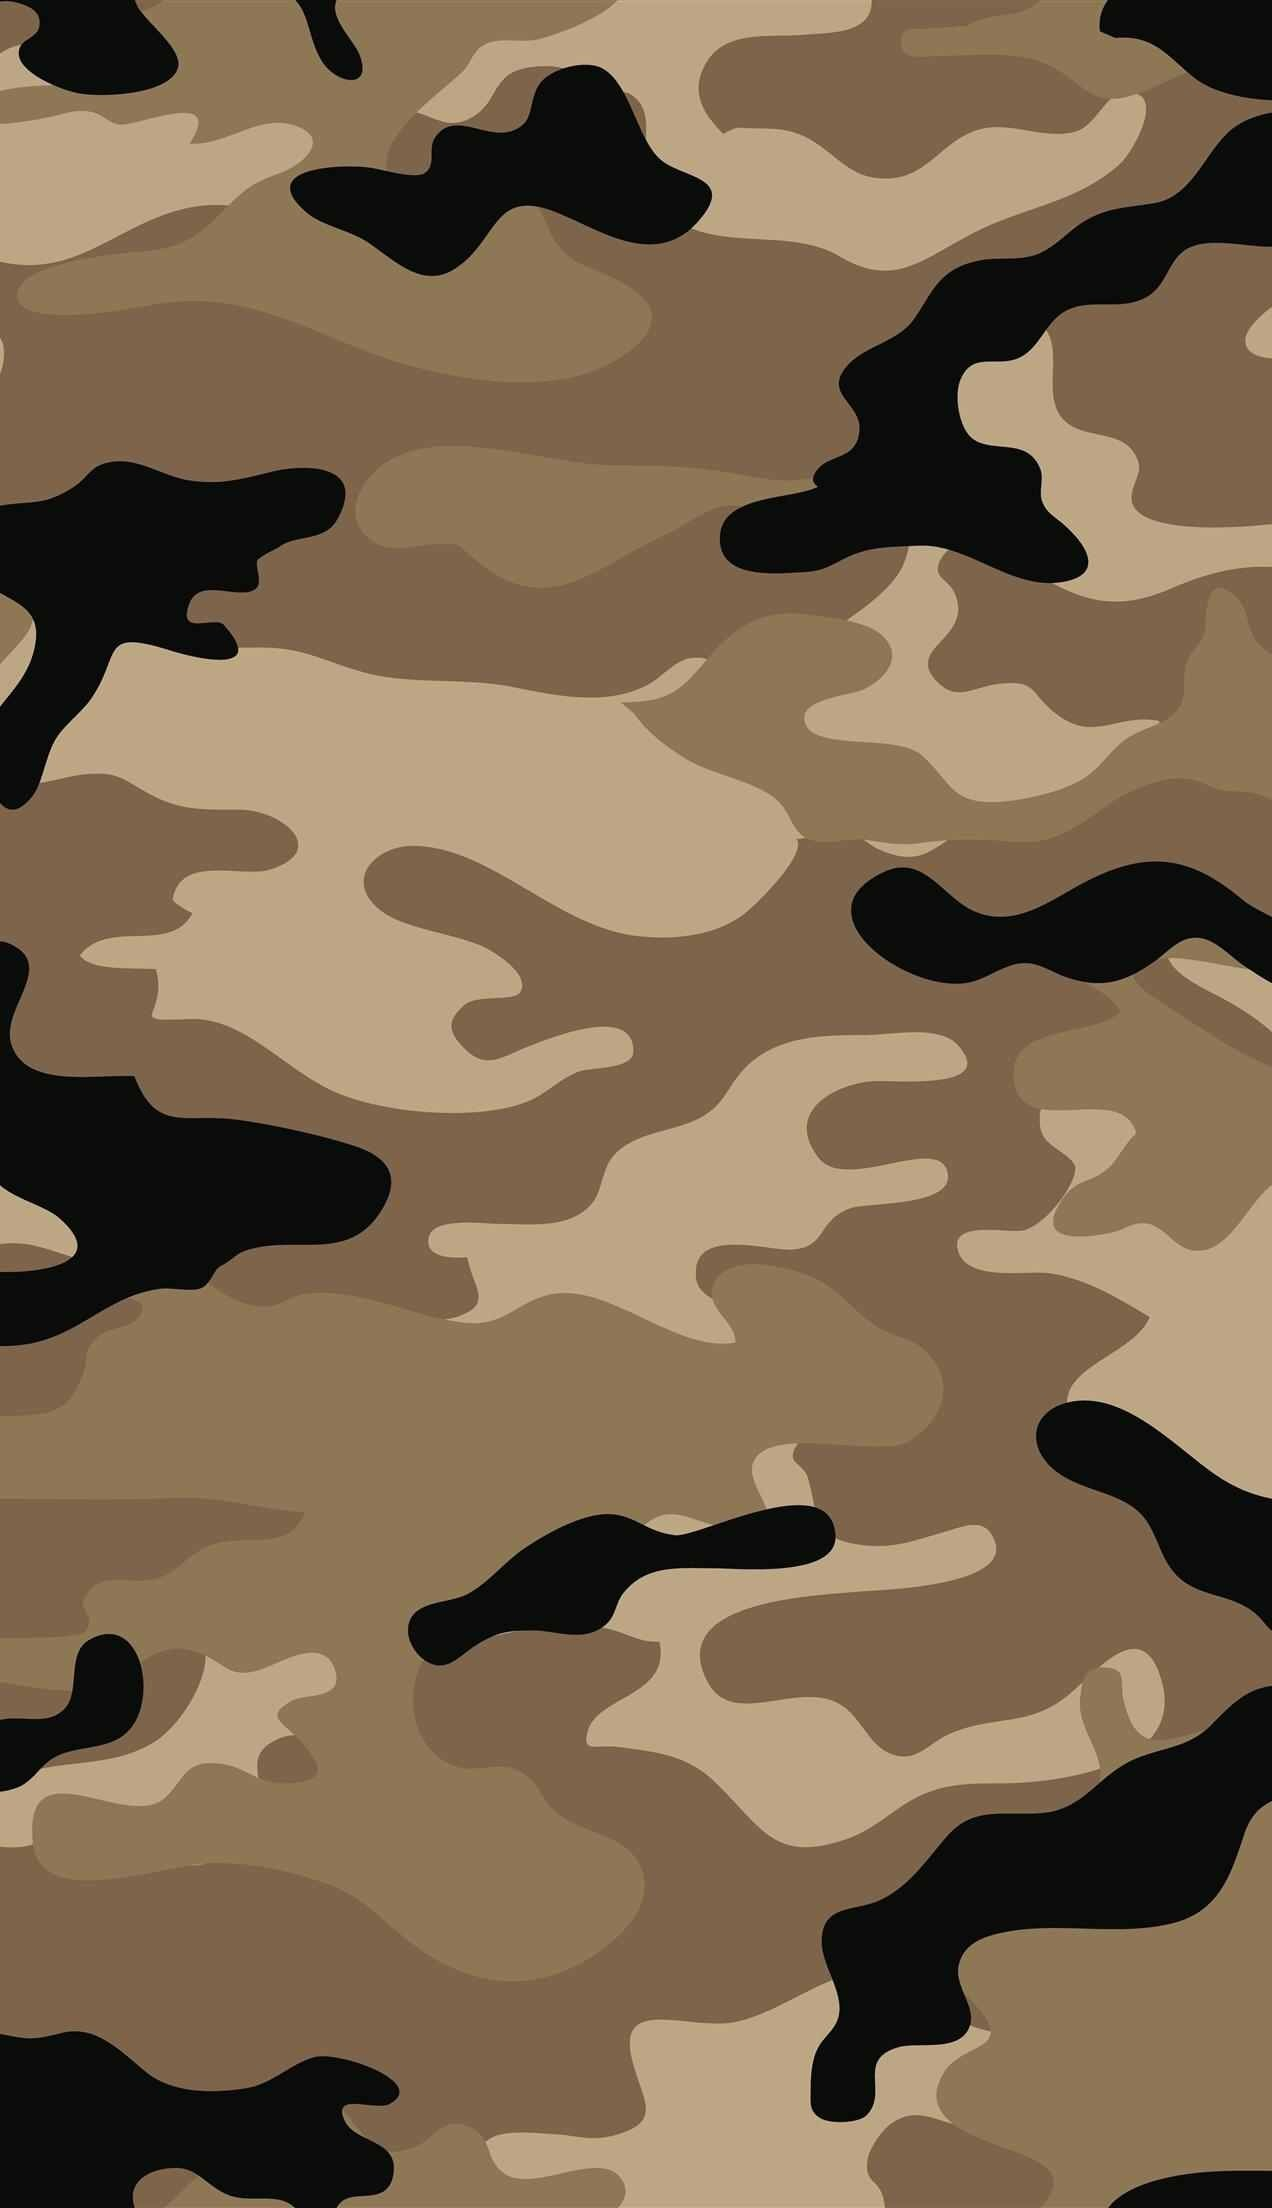 Explore Camo Wallpaper, Camouflage, and more!